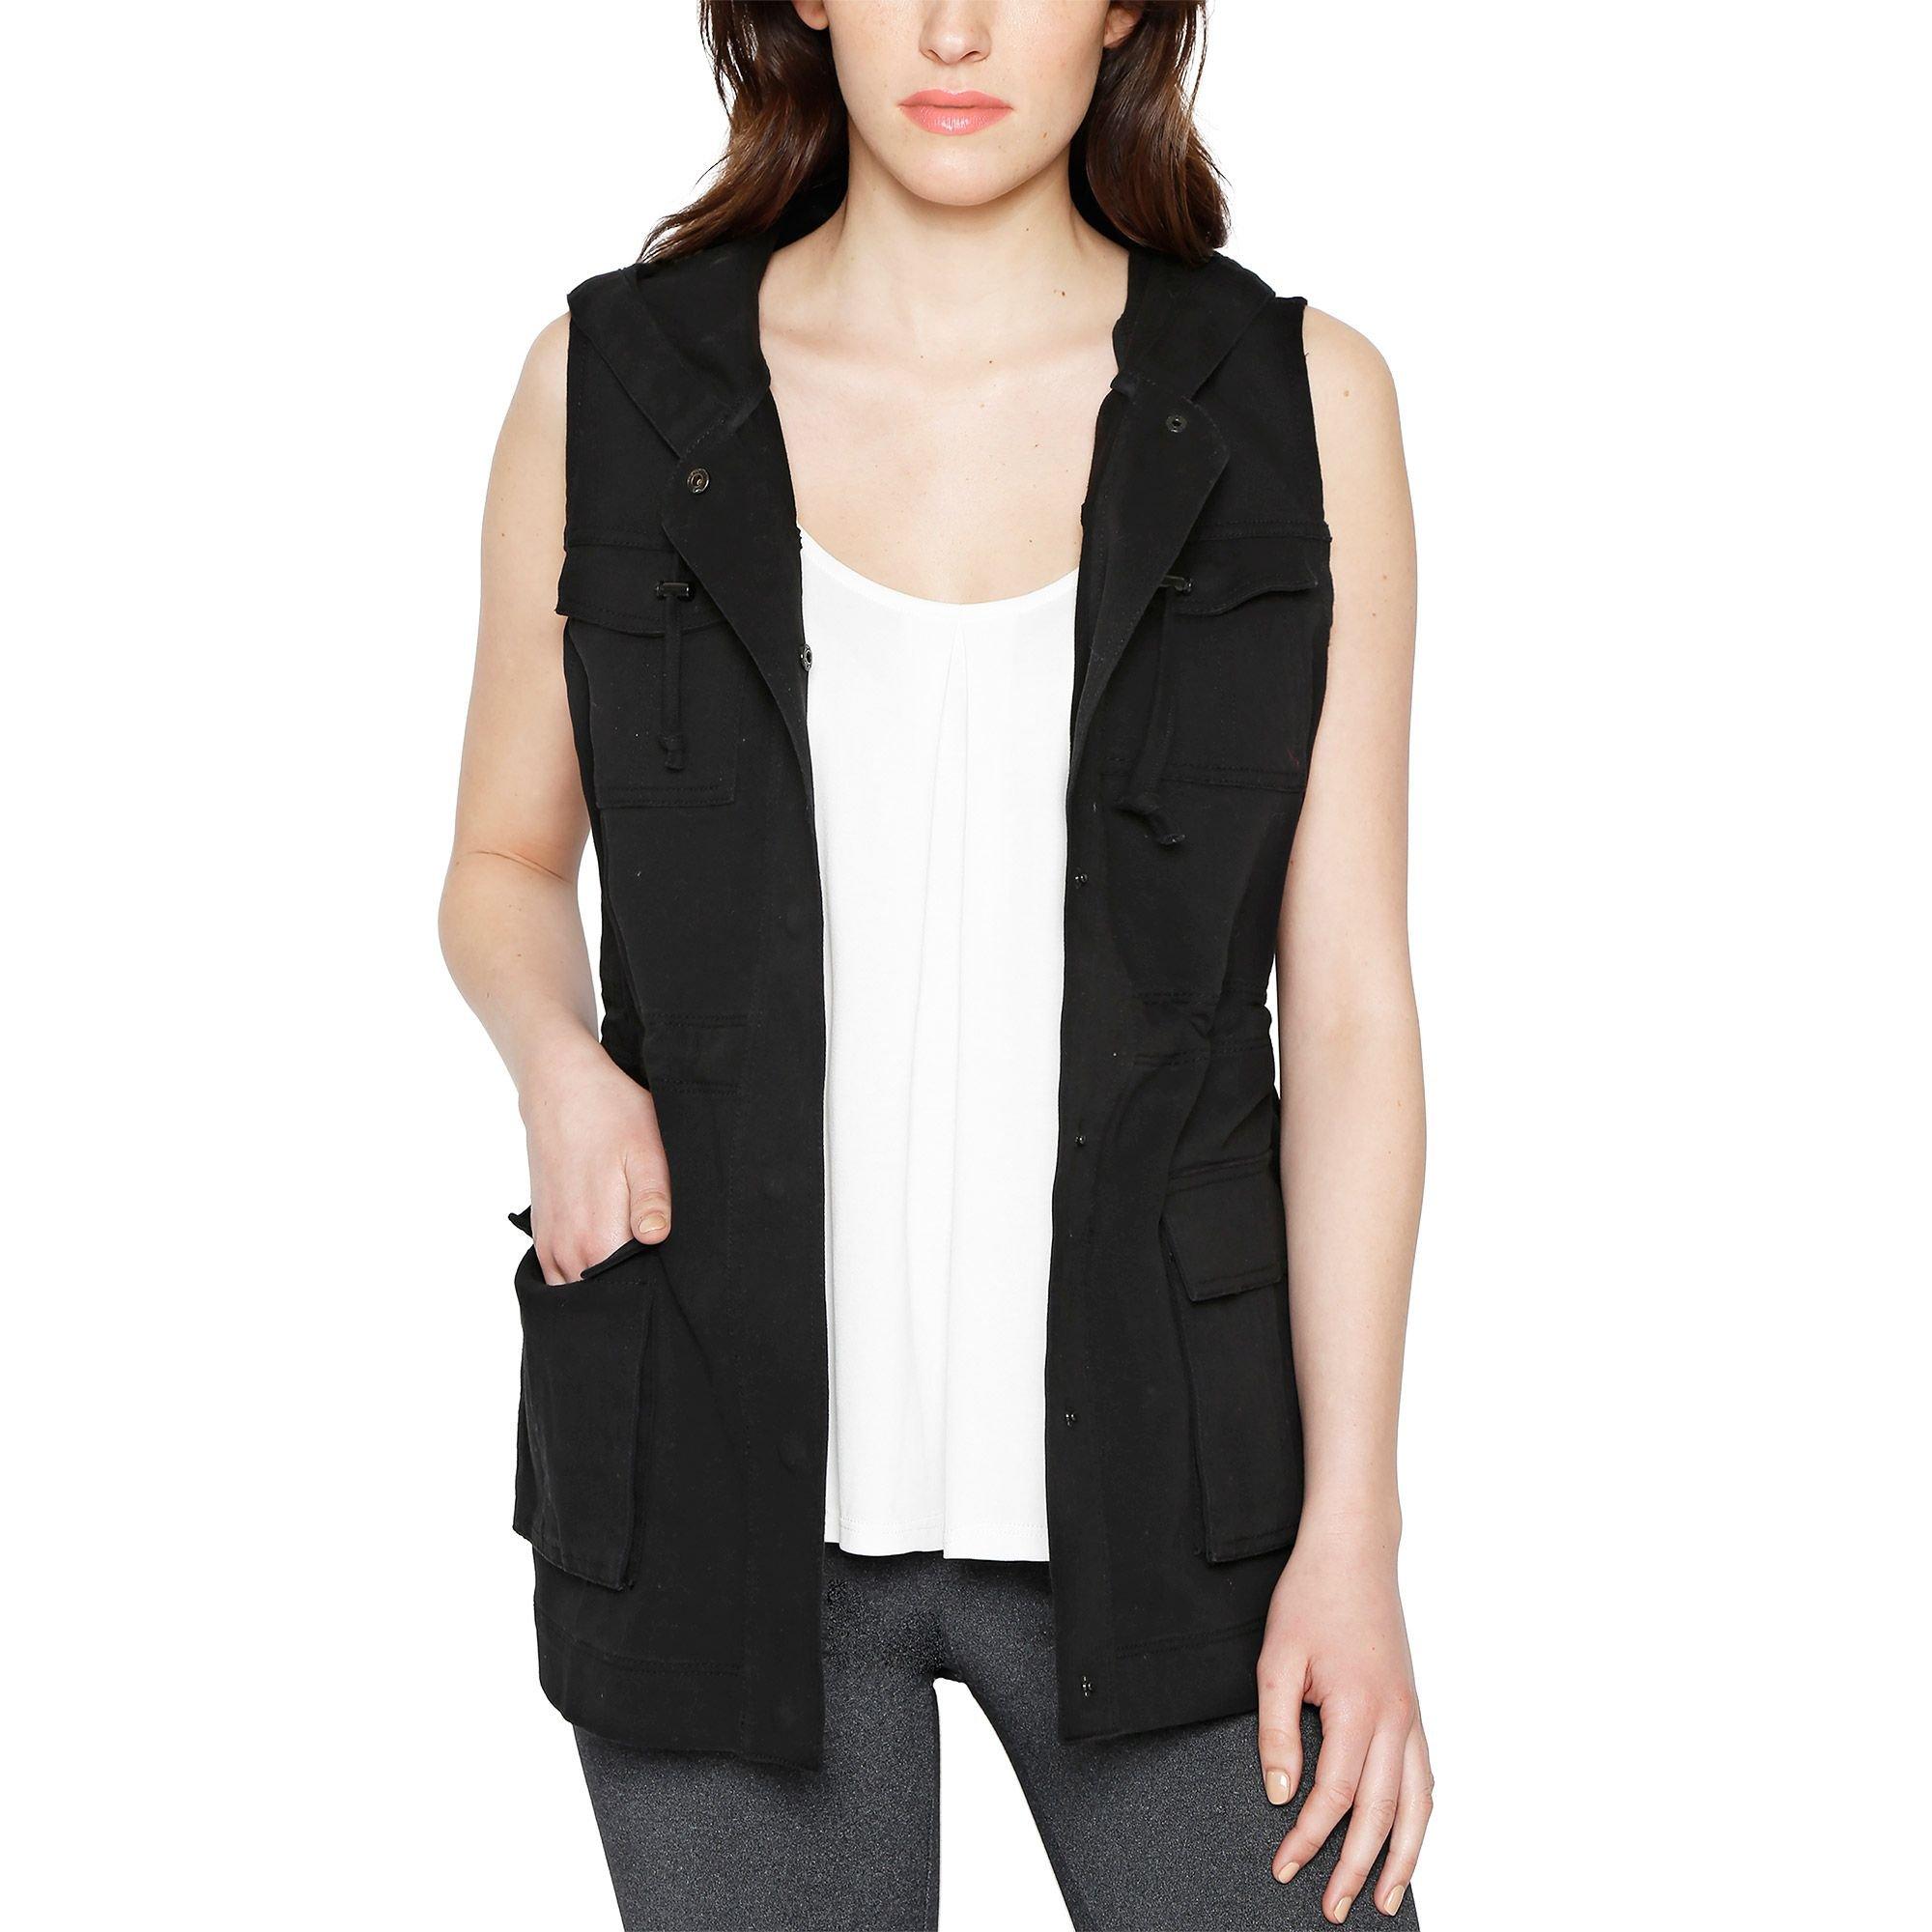 Matty M Women's Cargo Vest, Small, Black